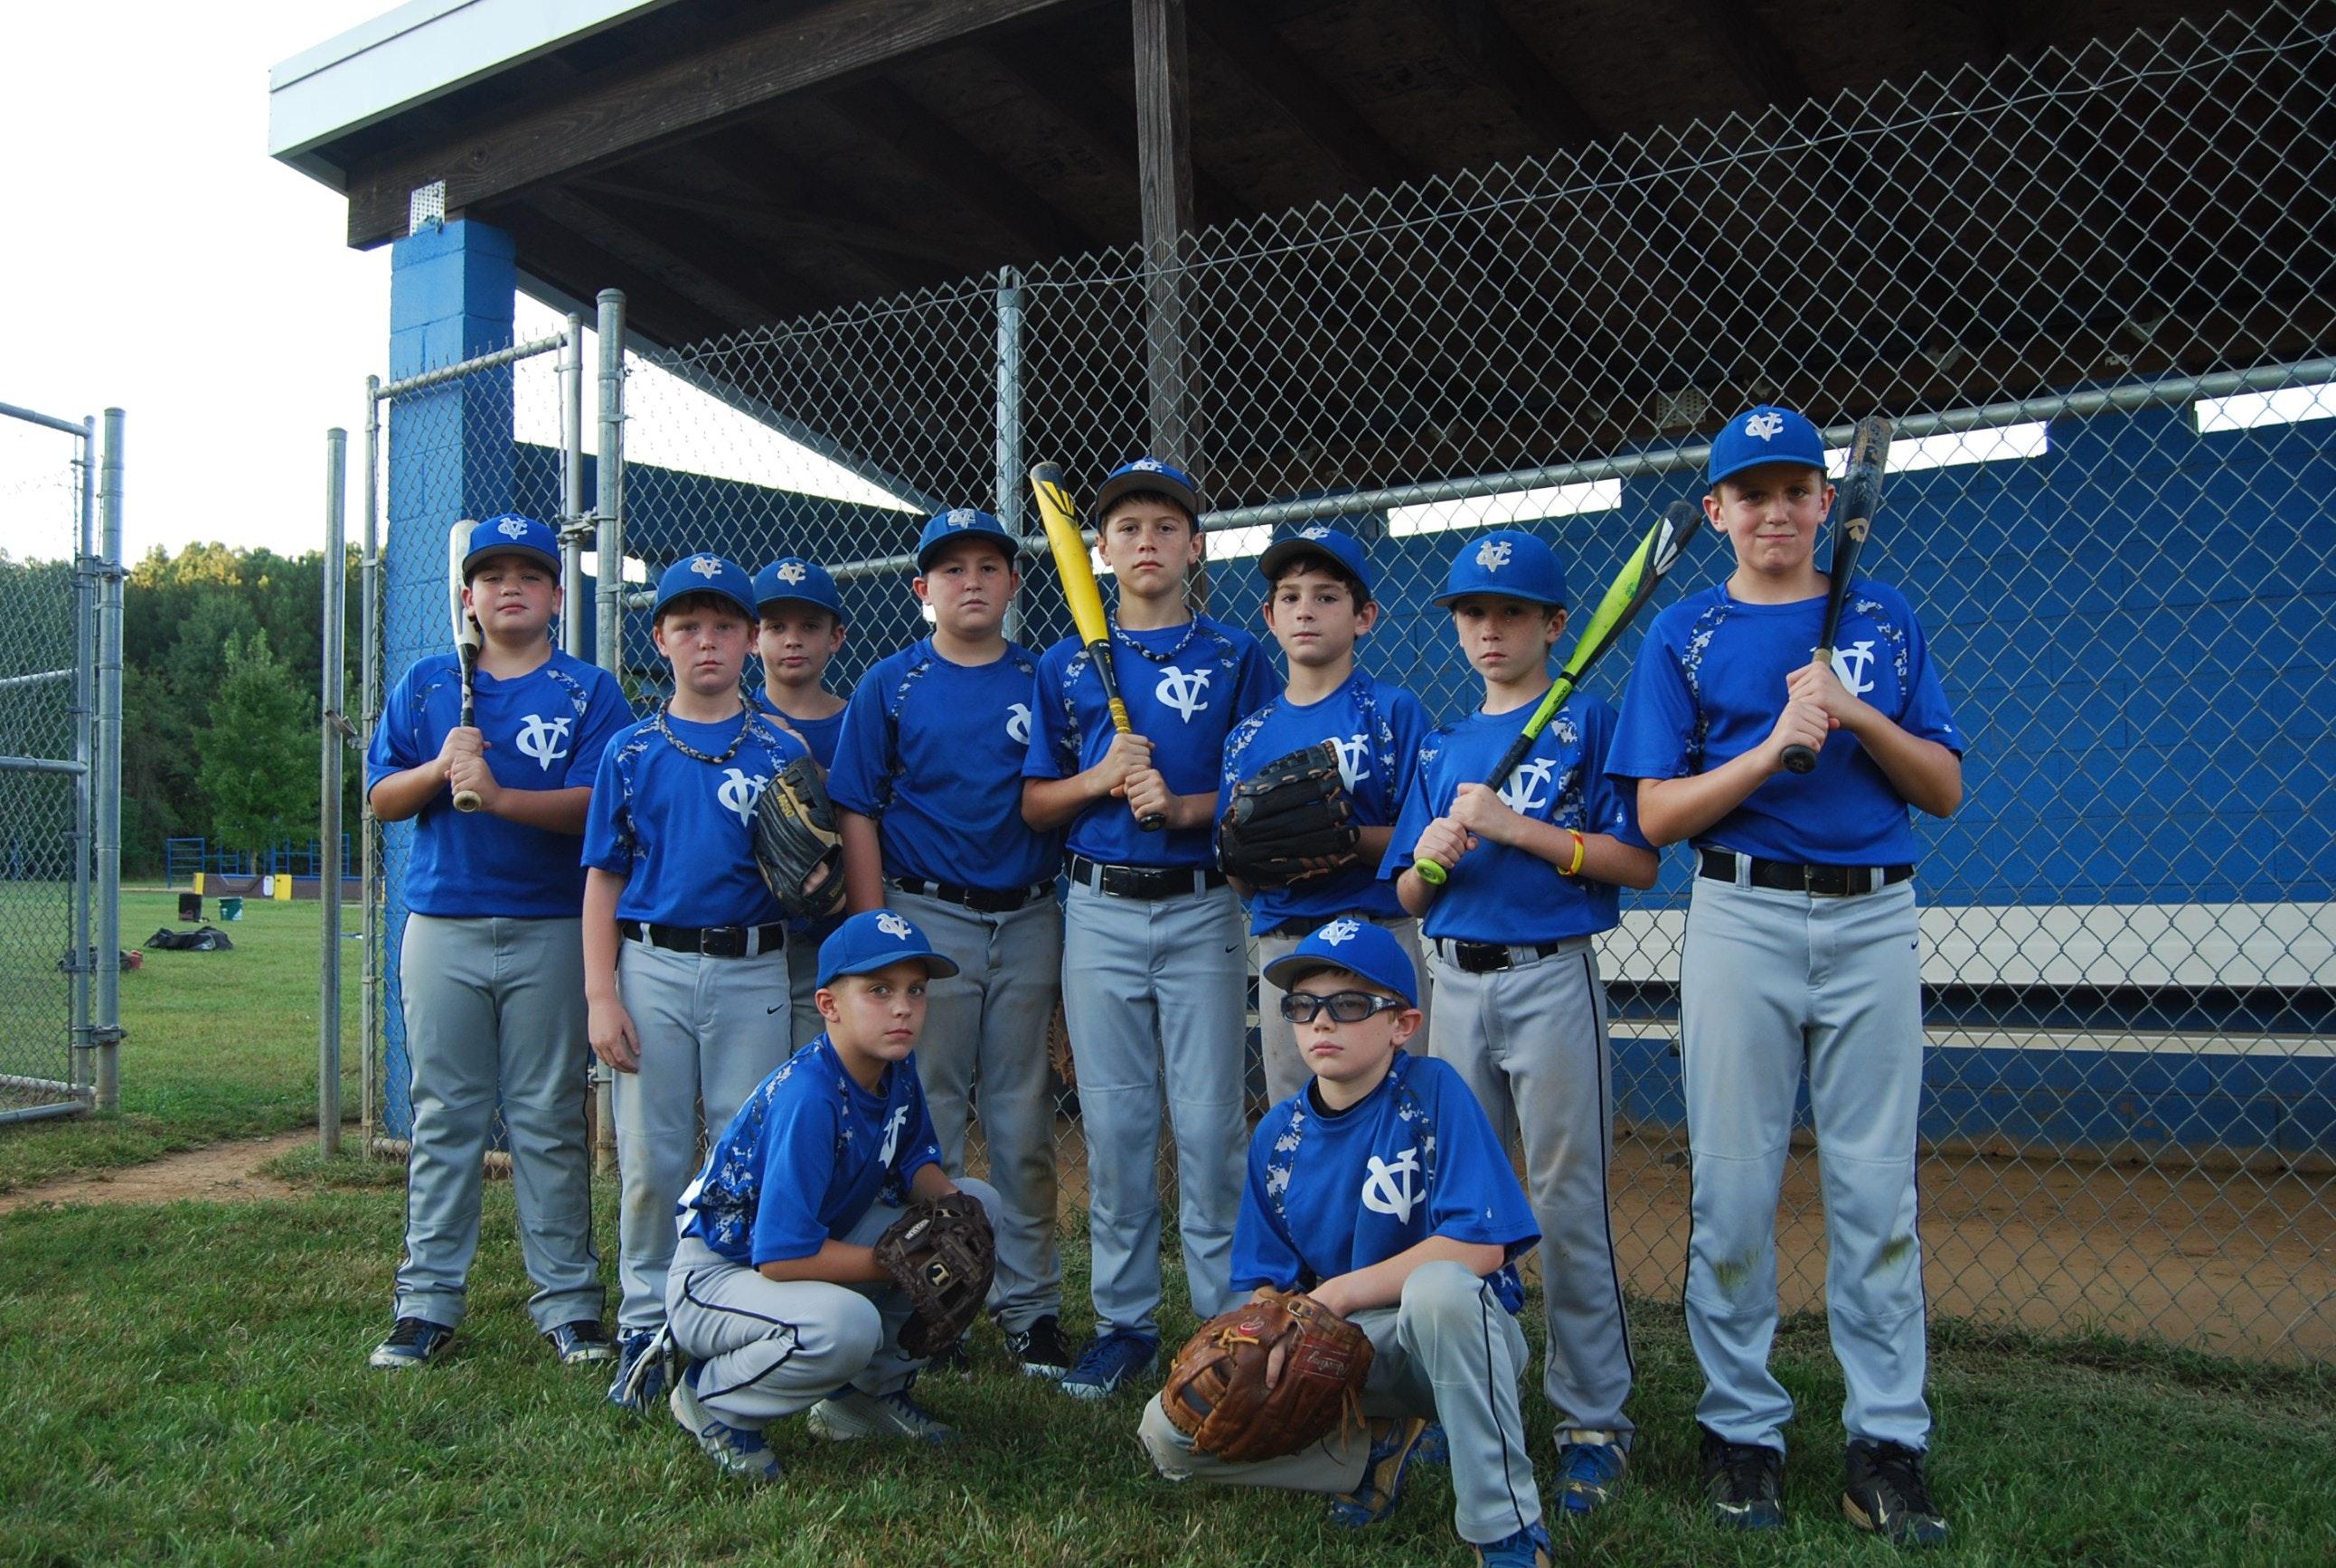 Virginia Cannons 11U Blue Travel Baseball